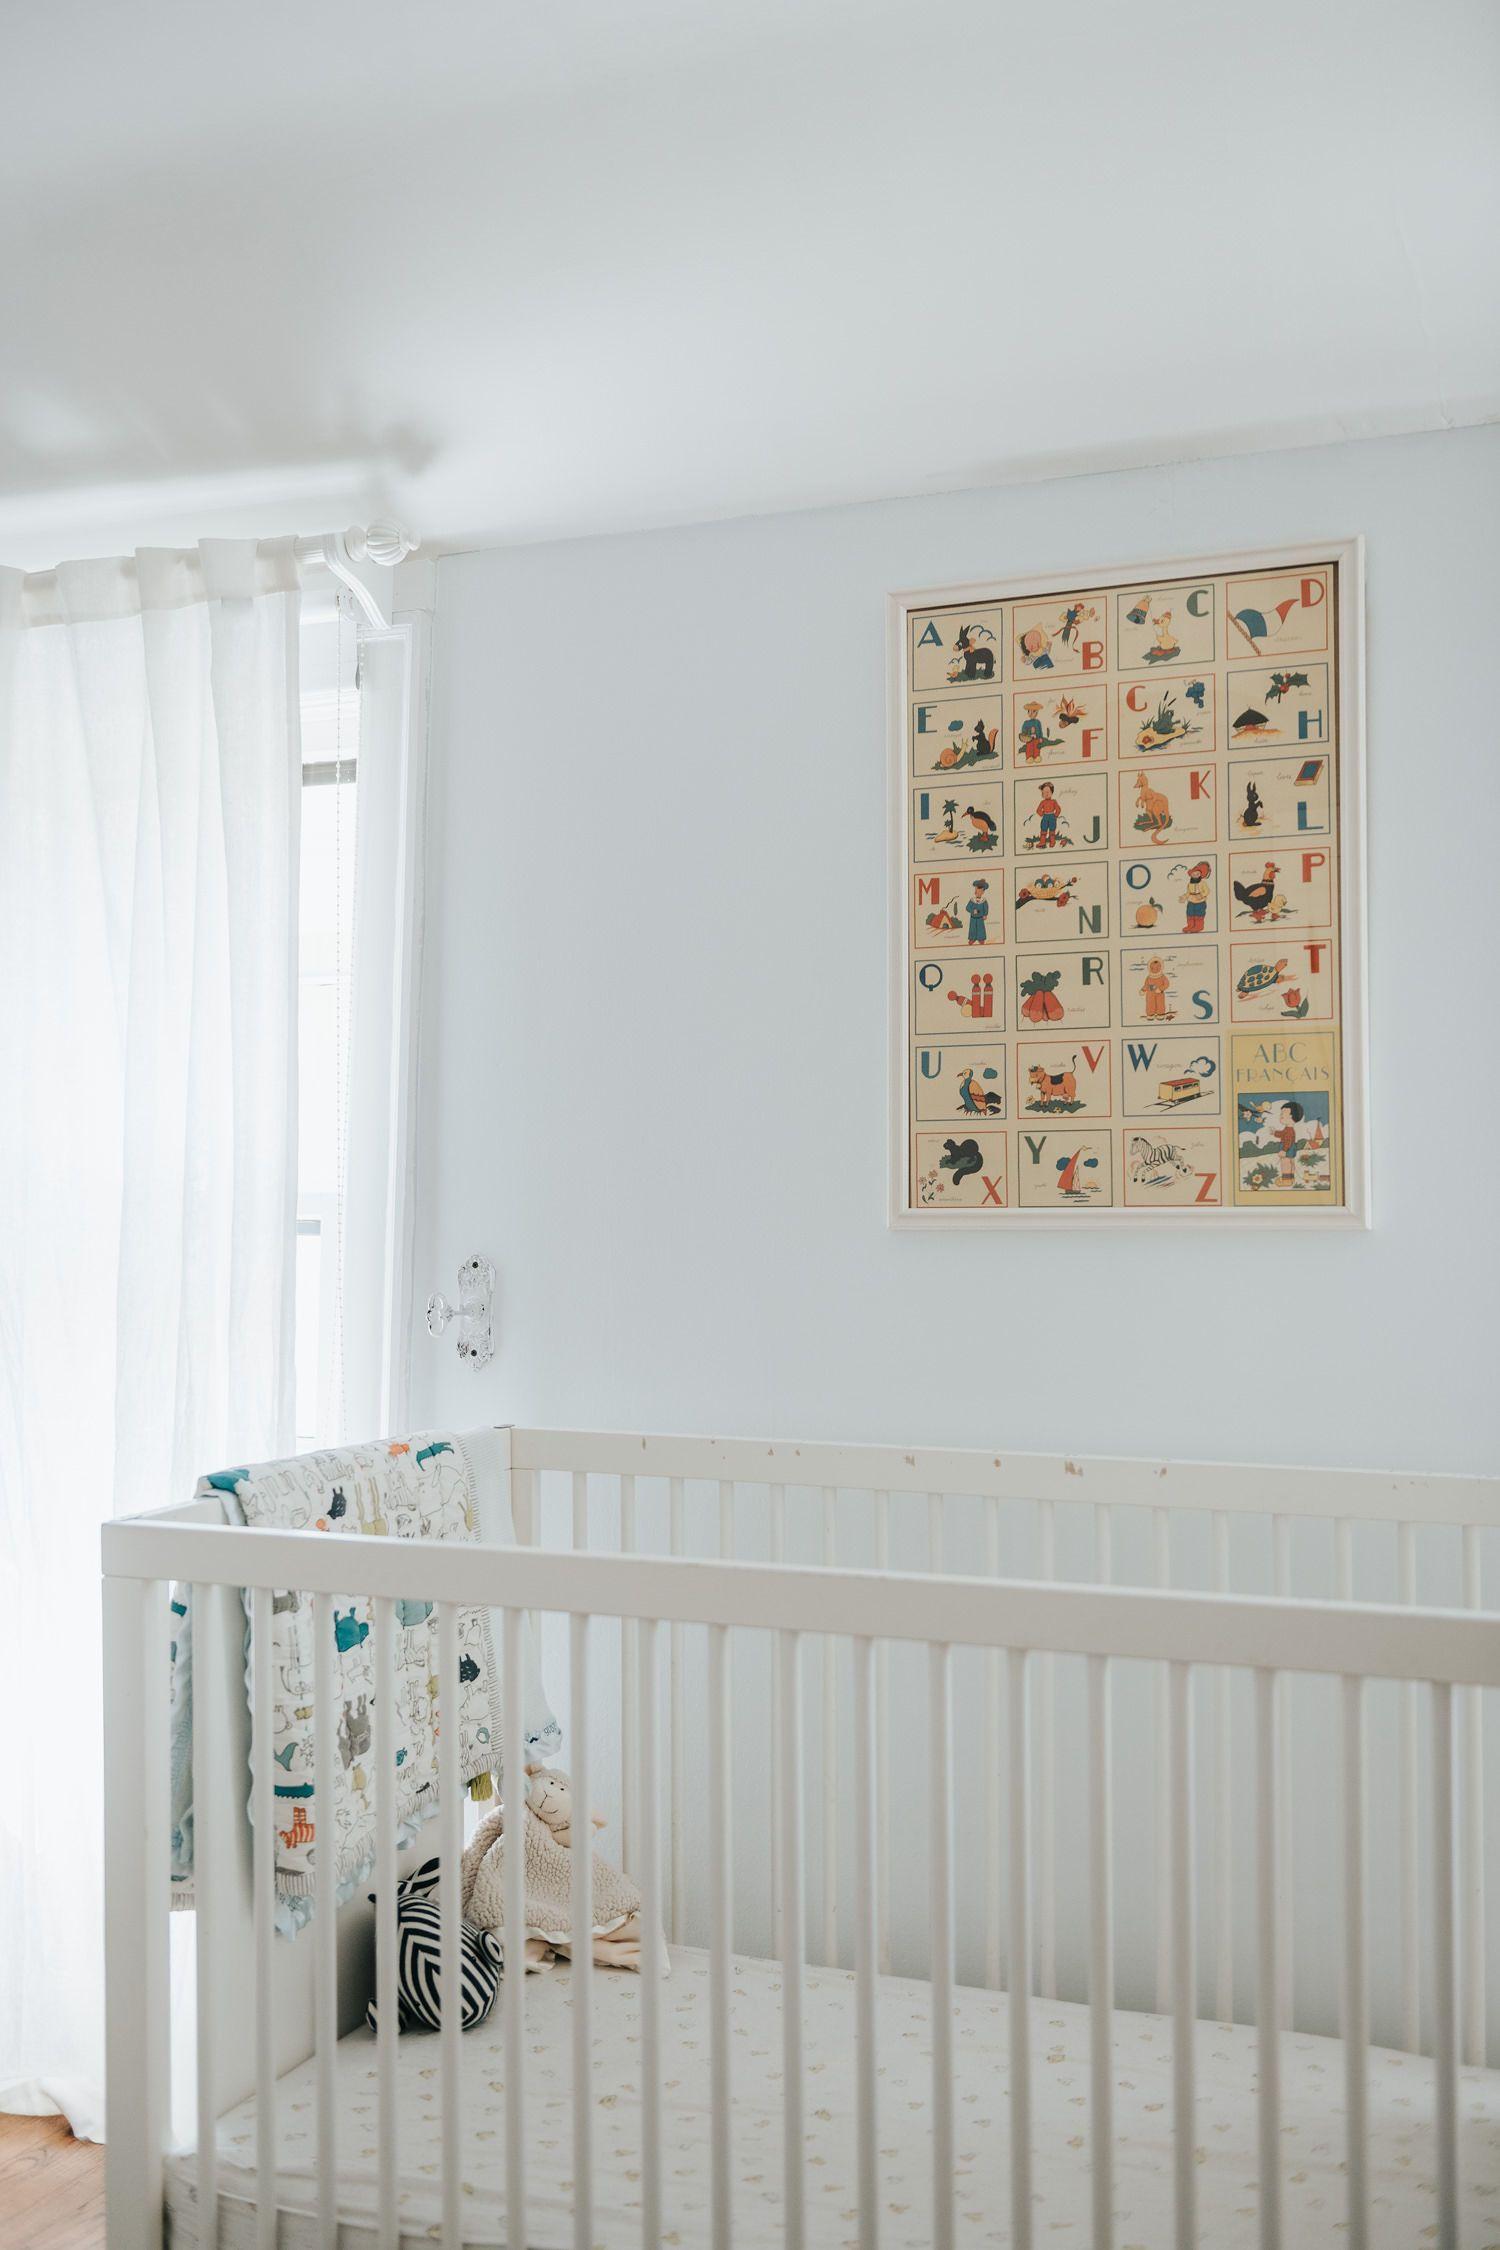 The frame is a vintage poster my sister bought us in France #thisoldtudor #homedecor #renovation #homereno #bedroom #interiordesign #nursery